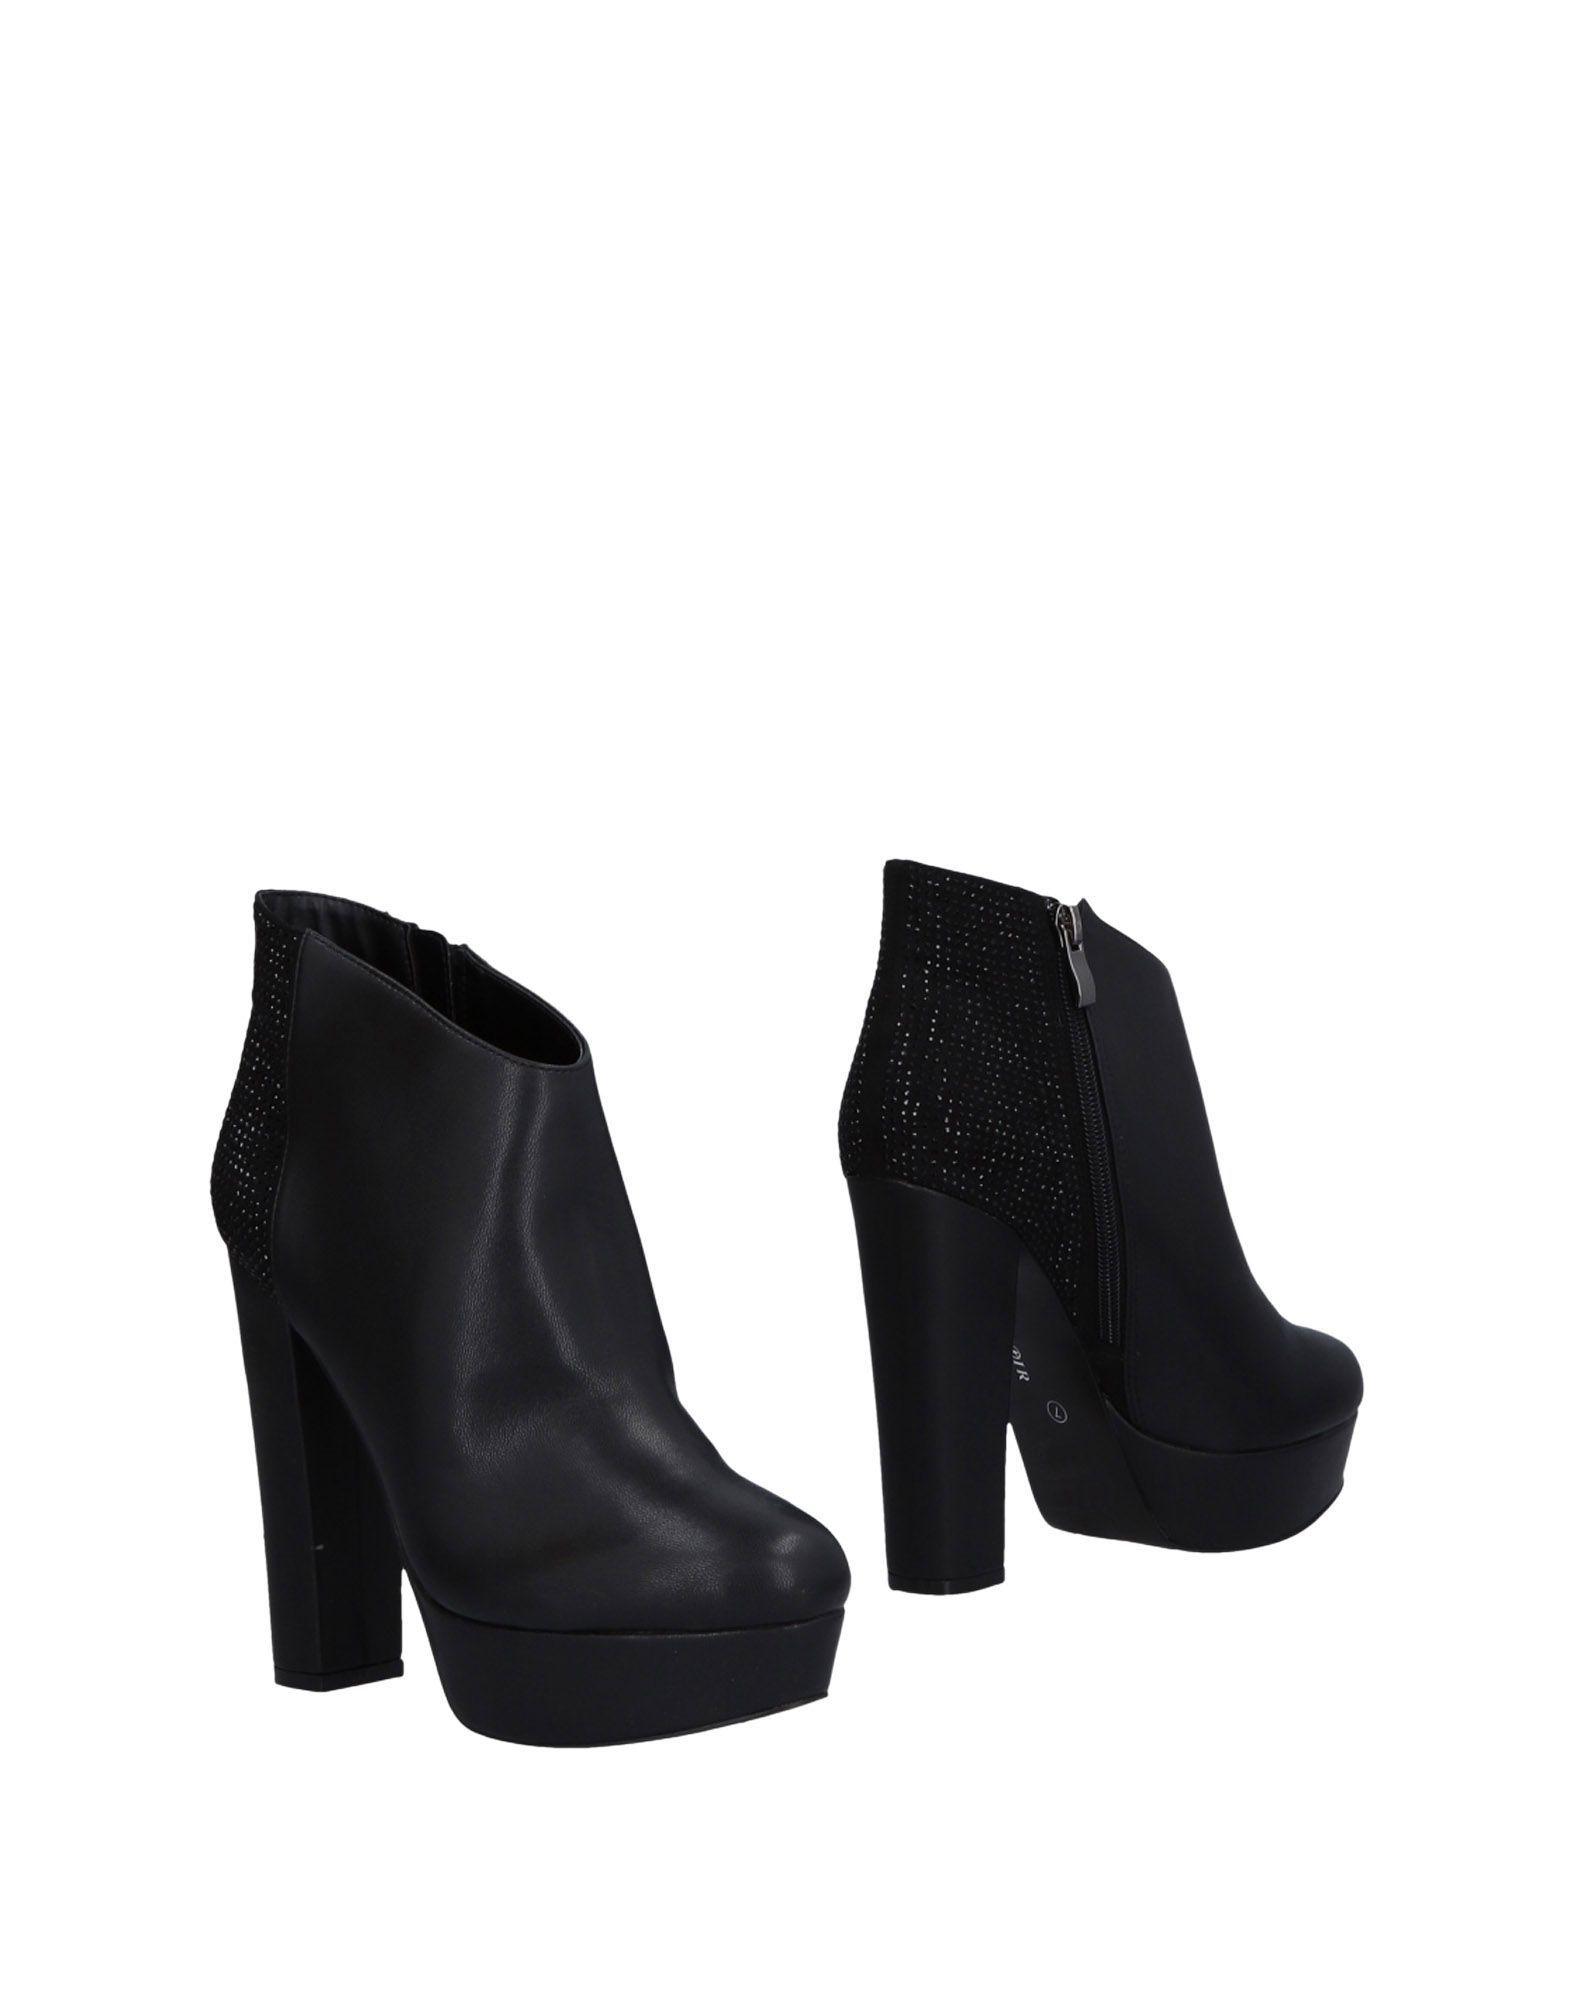 Cafenoir Black Heeled Ankle Boots